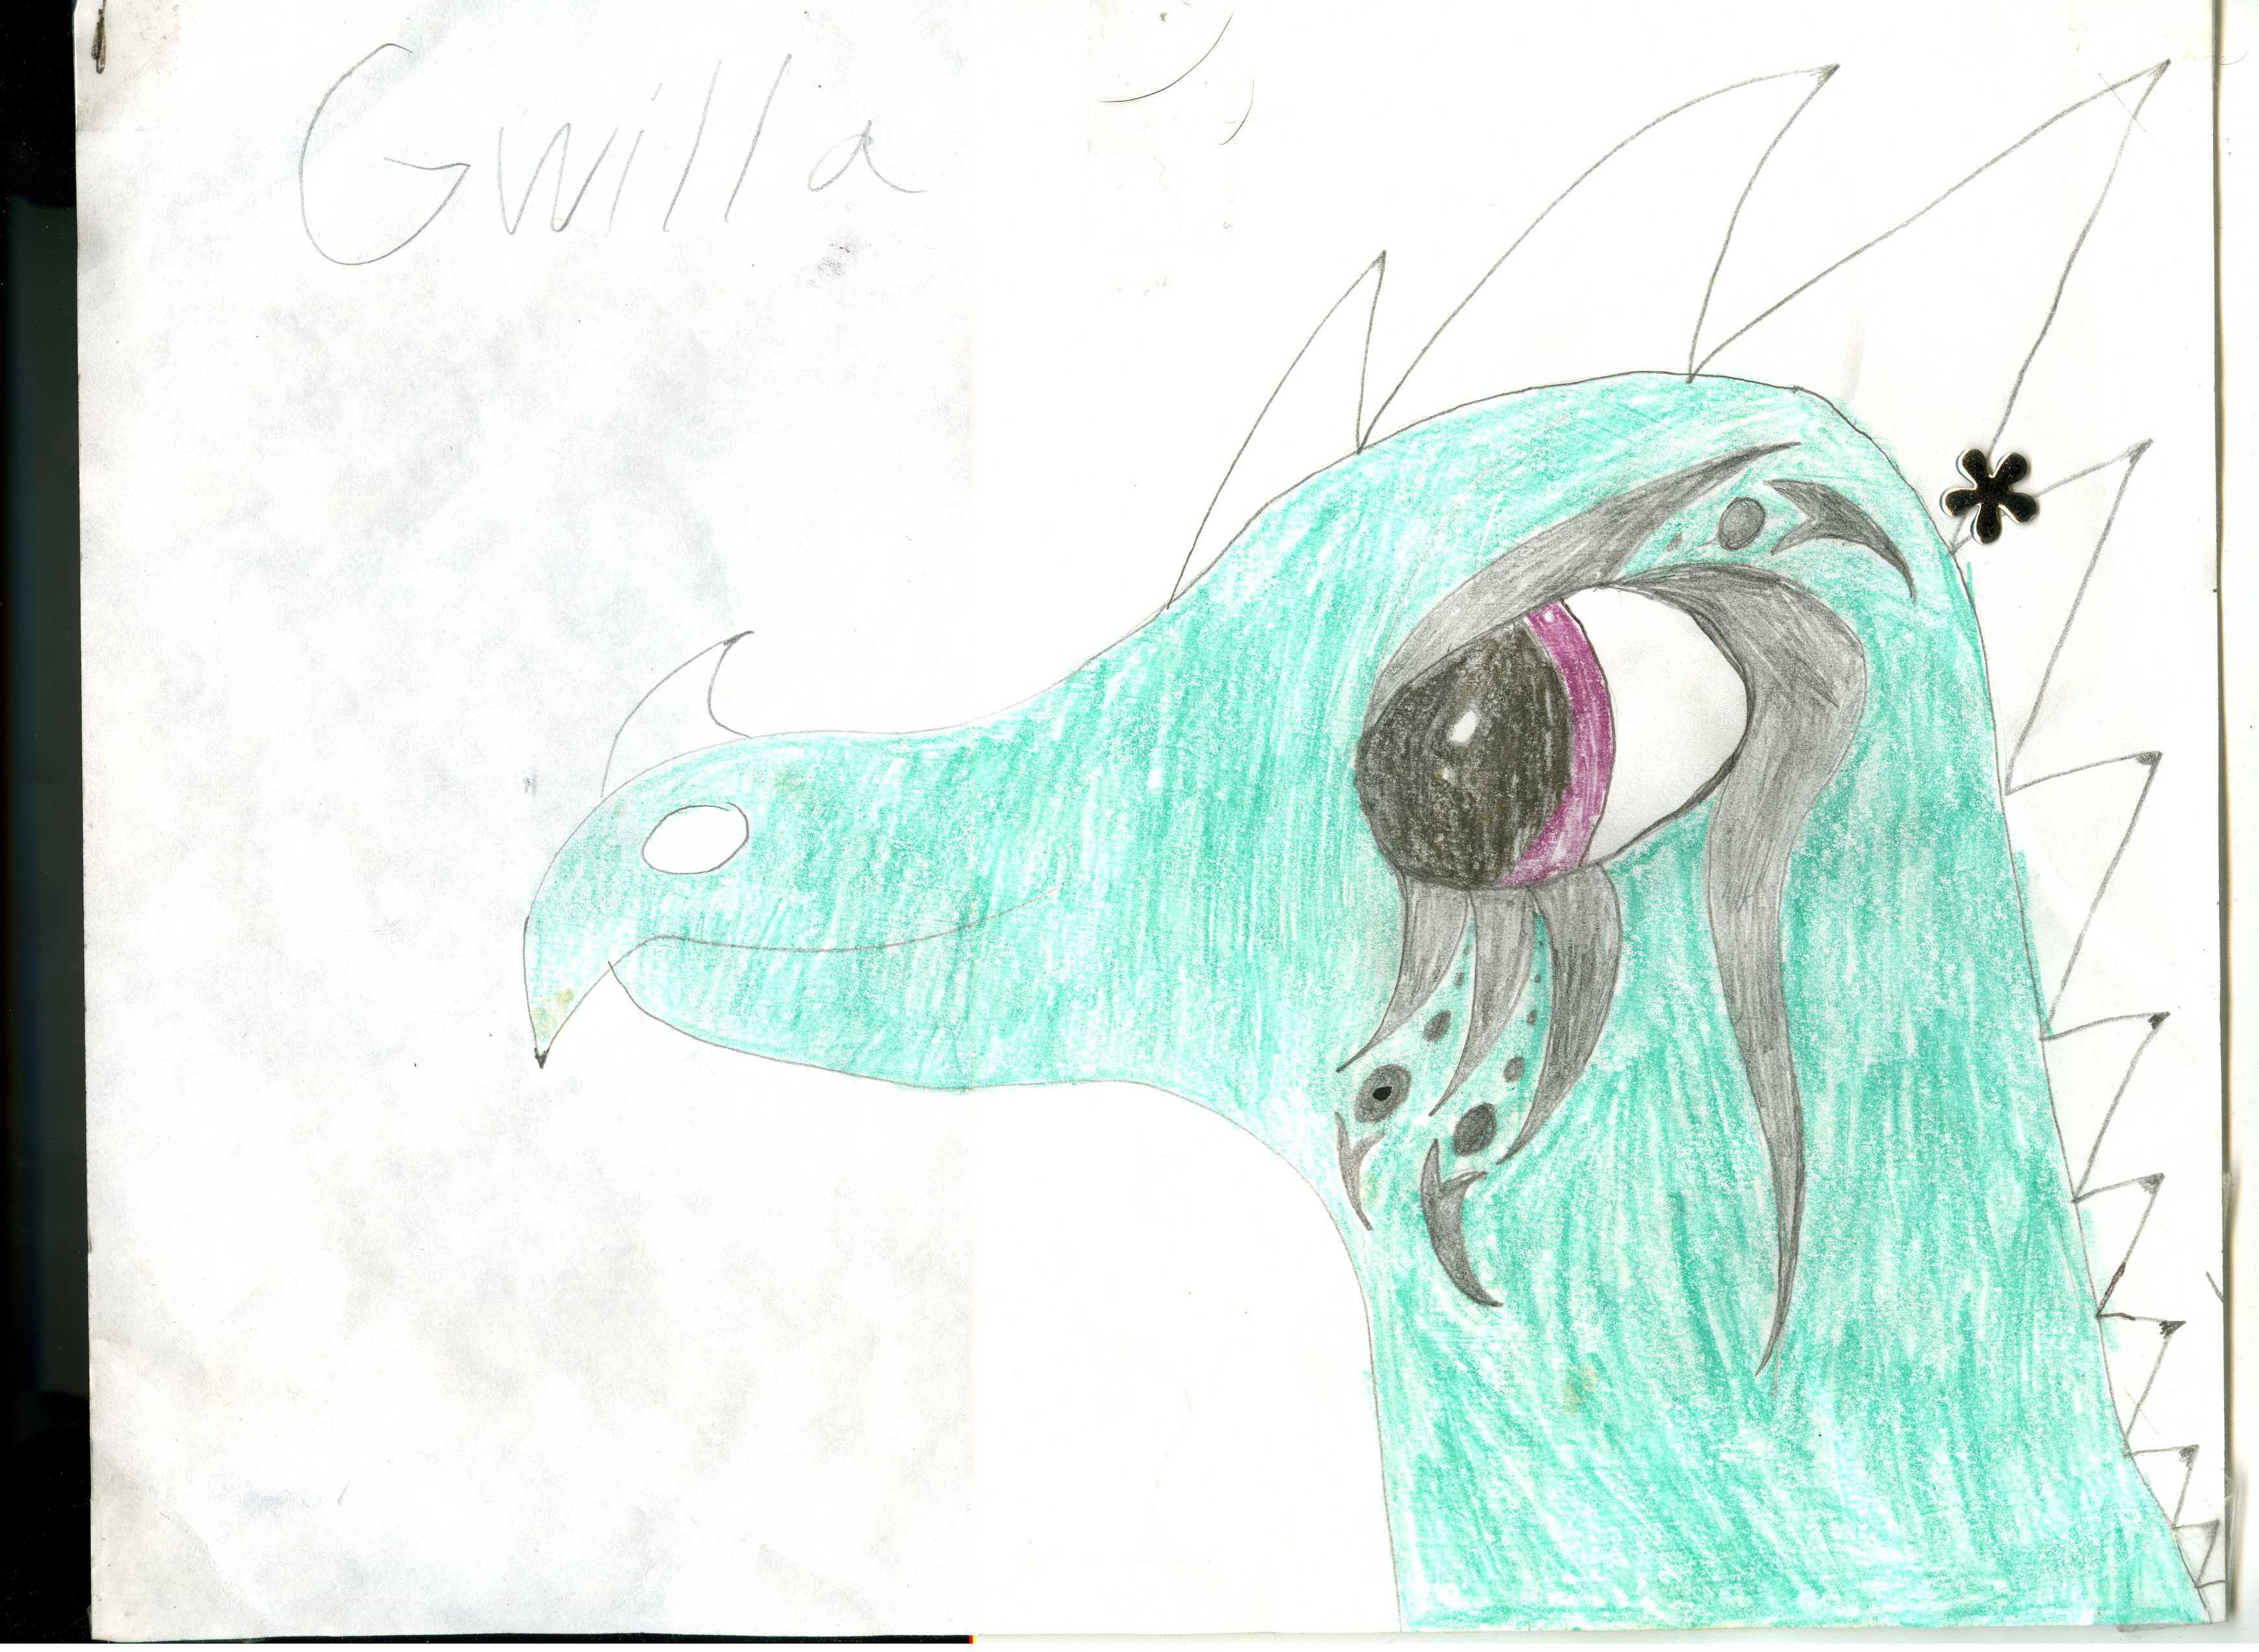 Gwilla The First by GwillaTheDragon